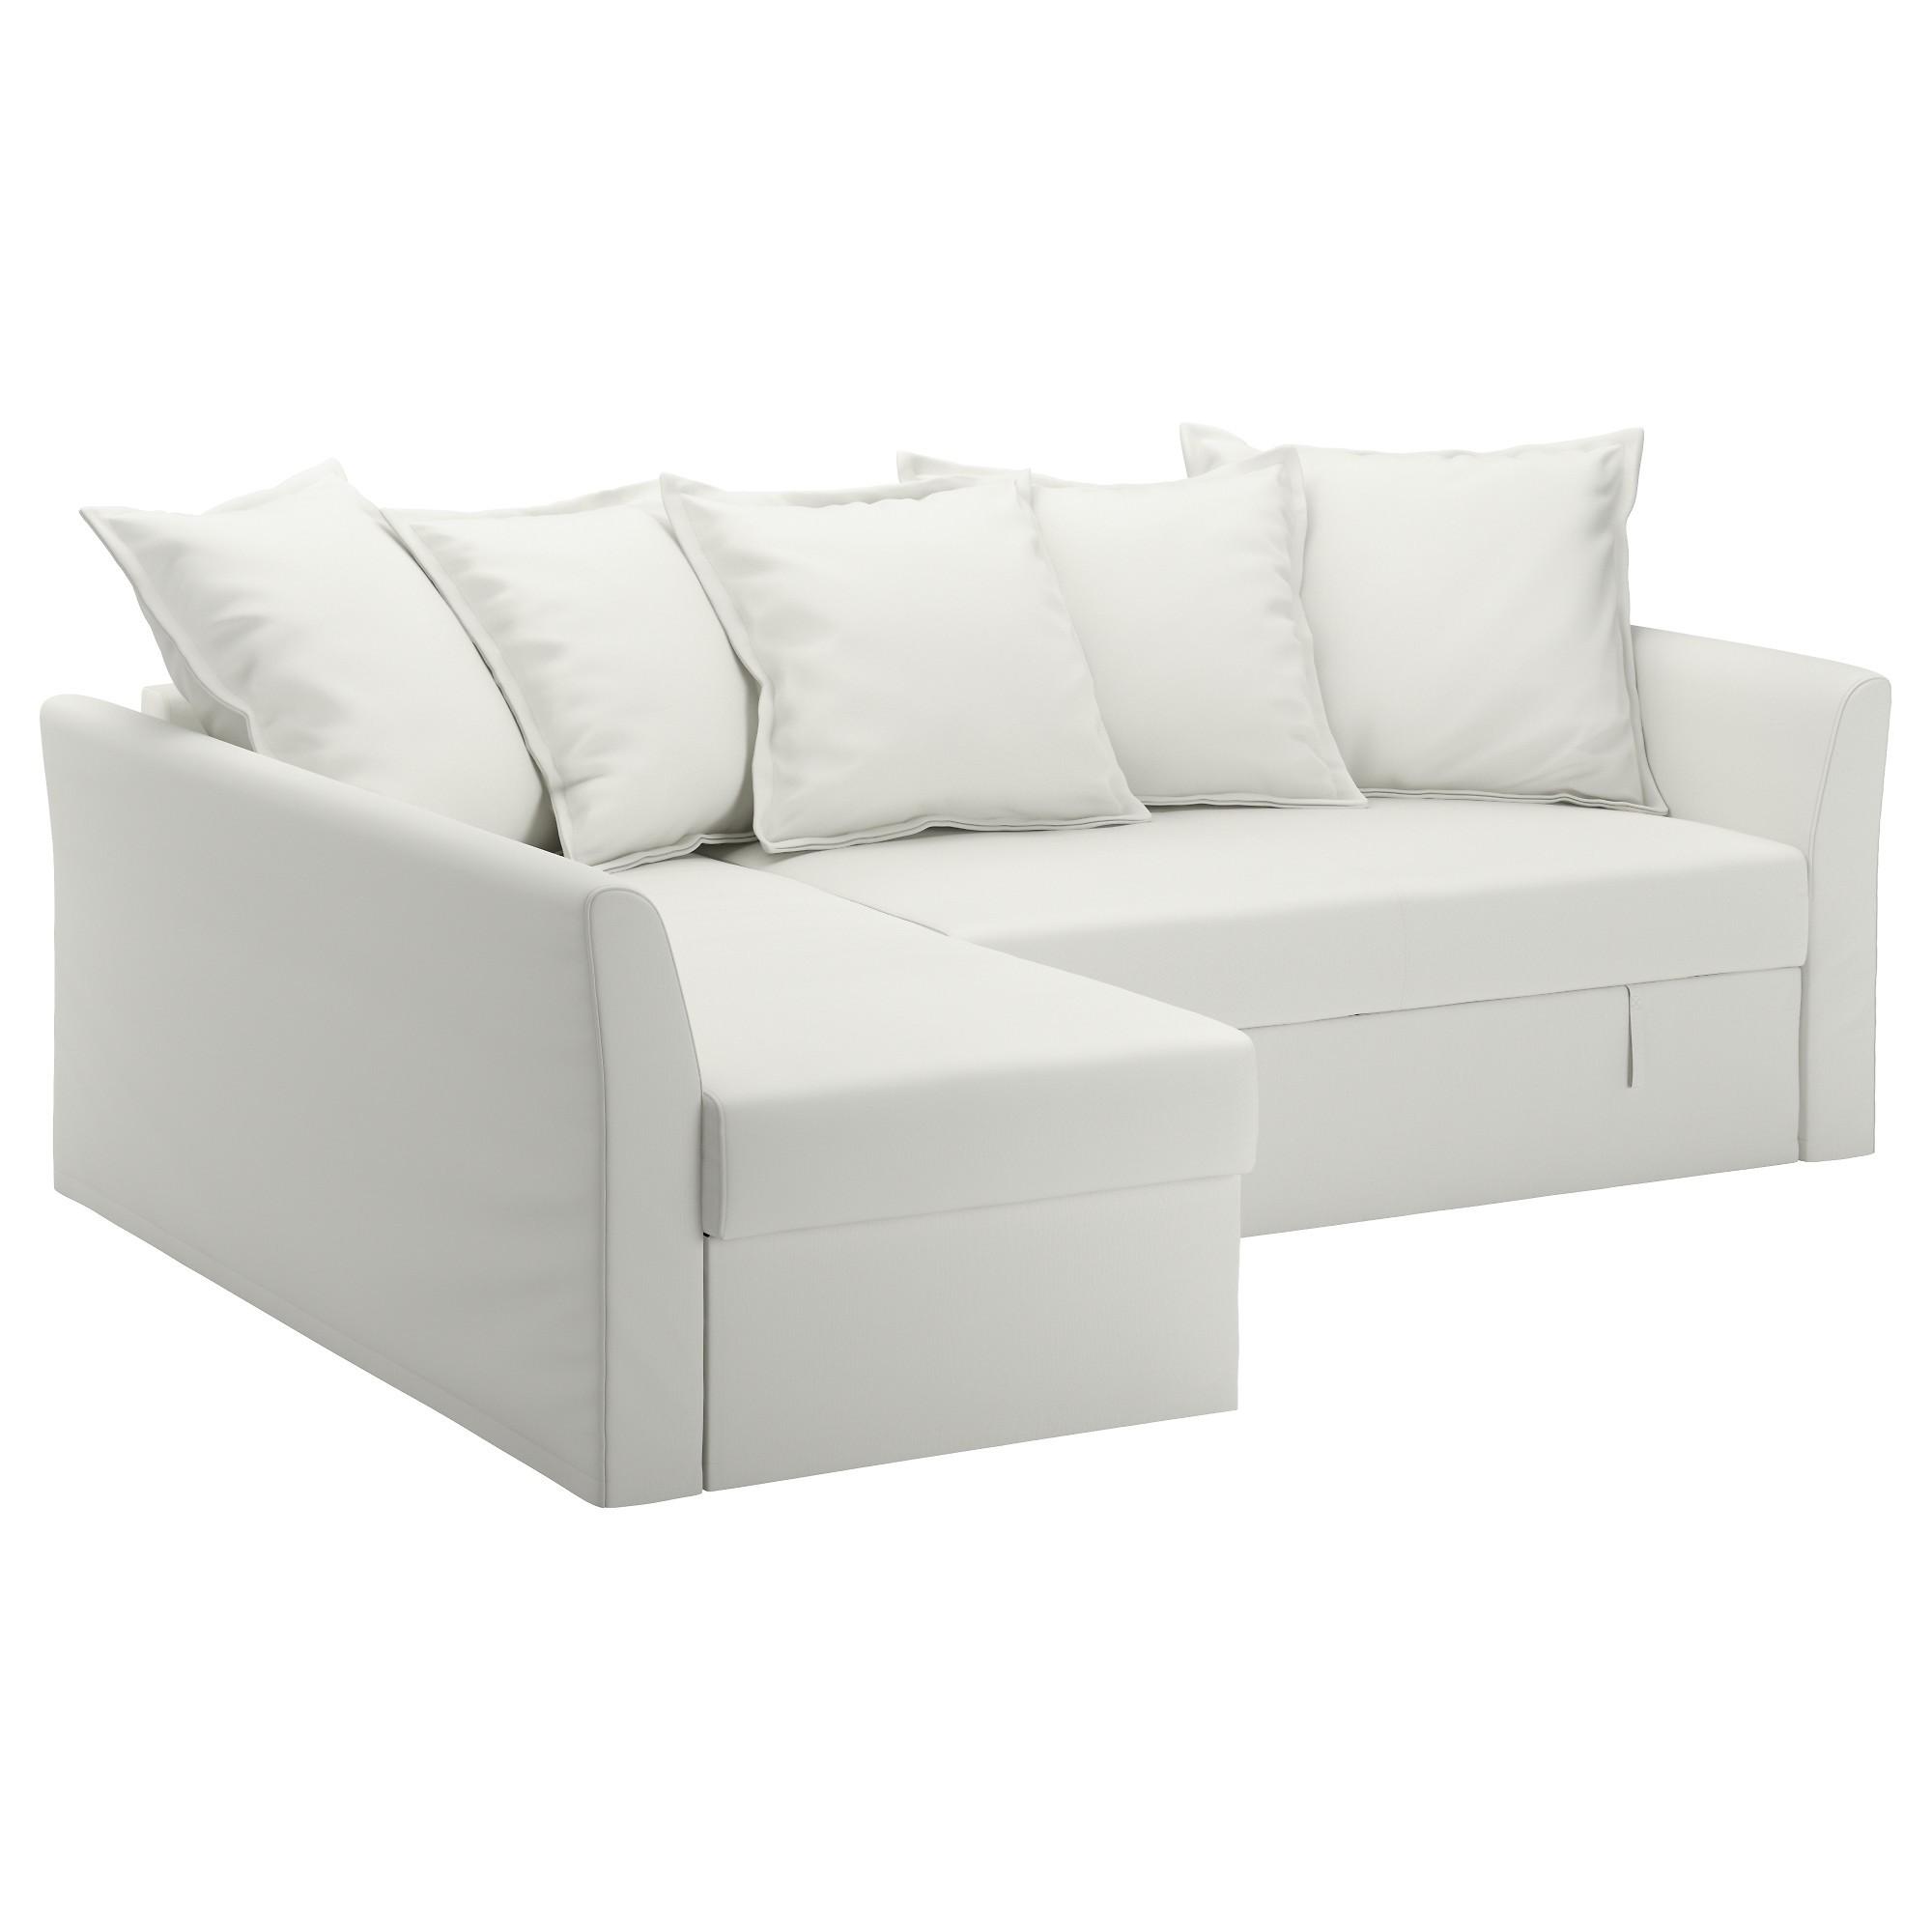 Housse De Canapé Futon Ikea